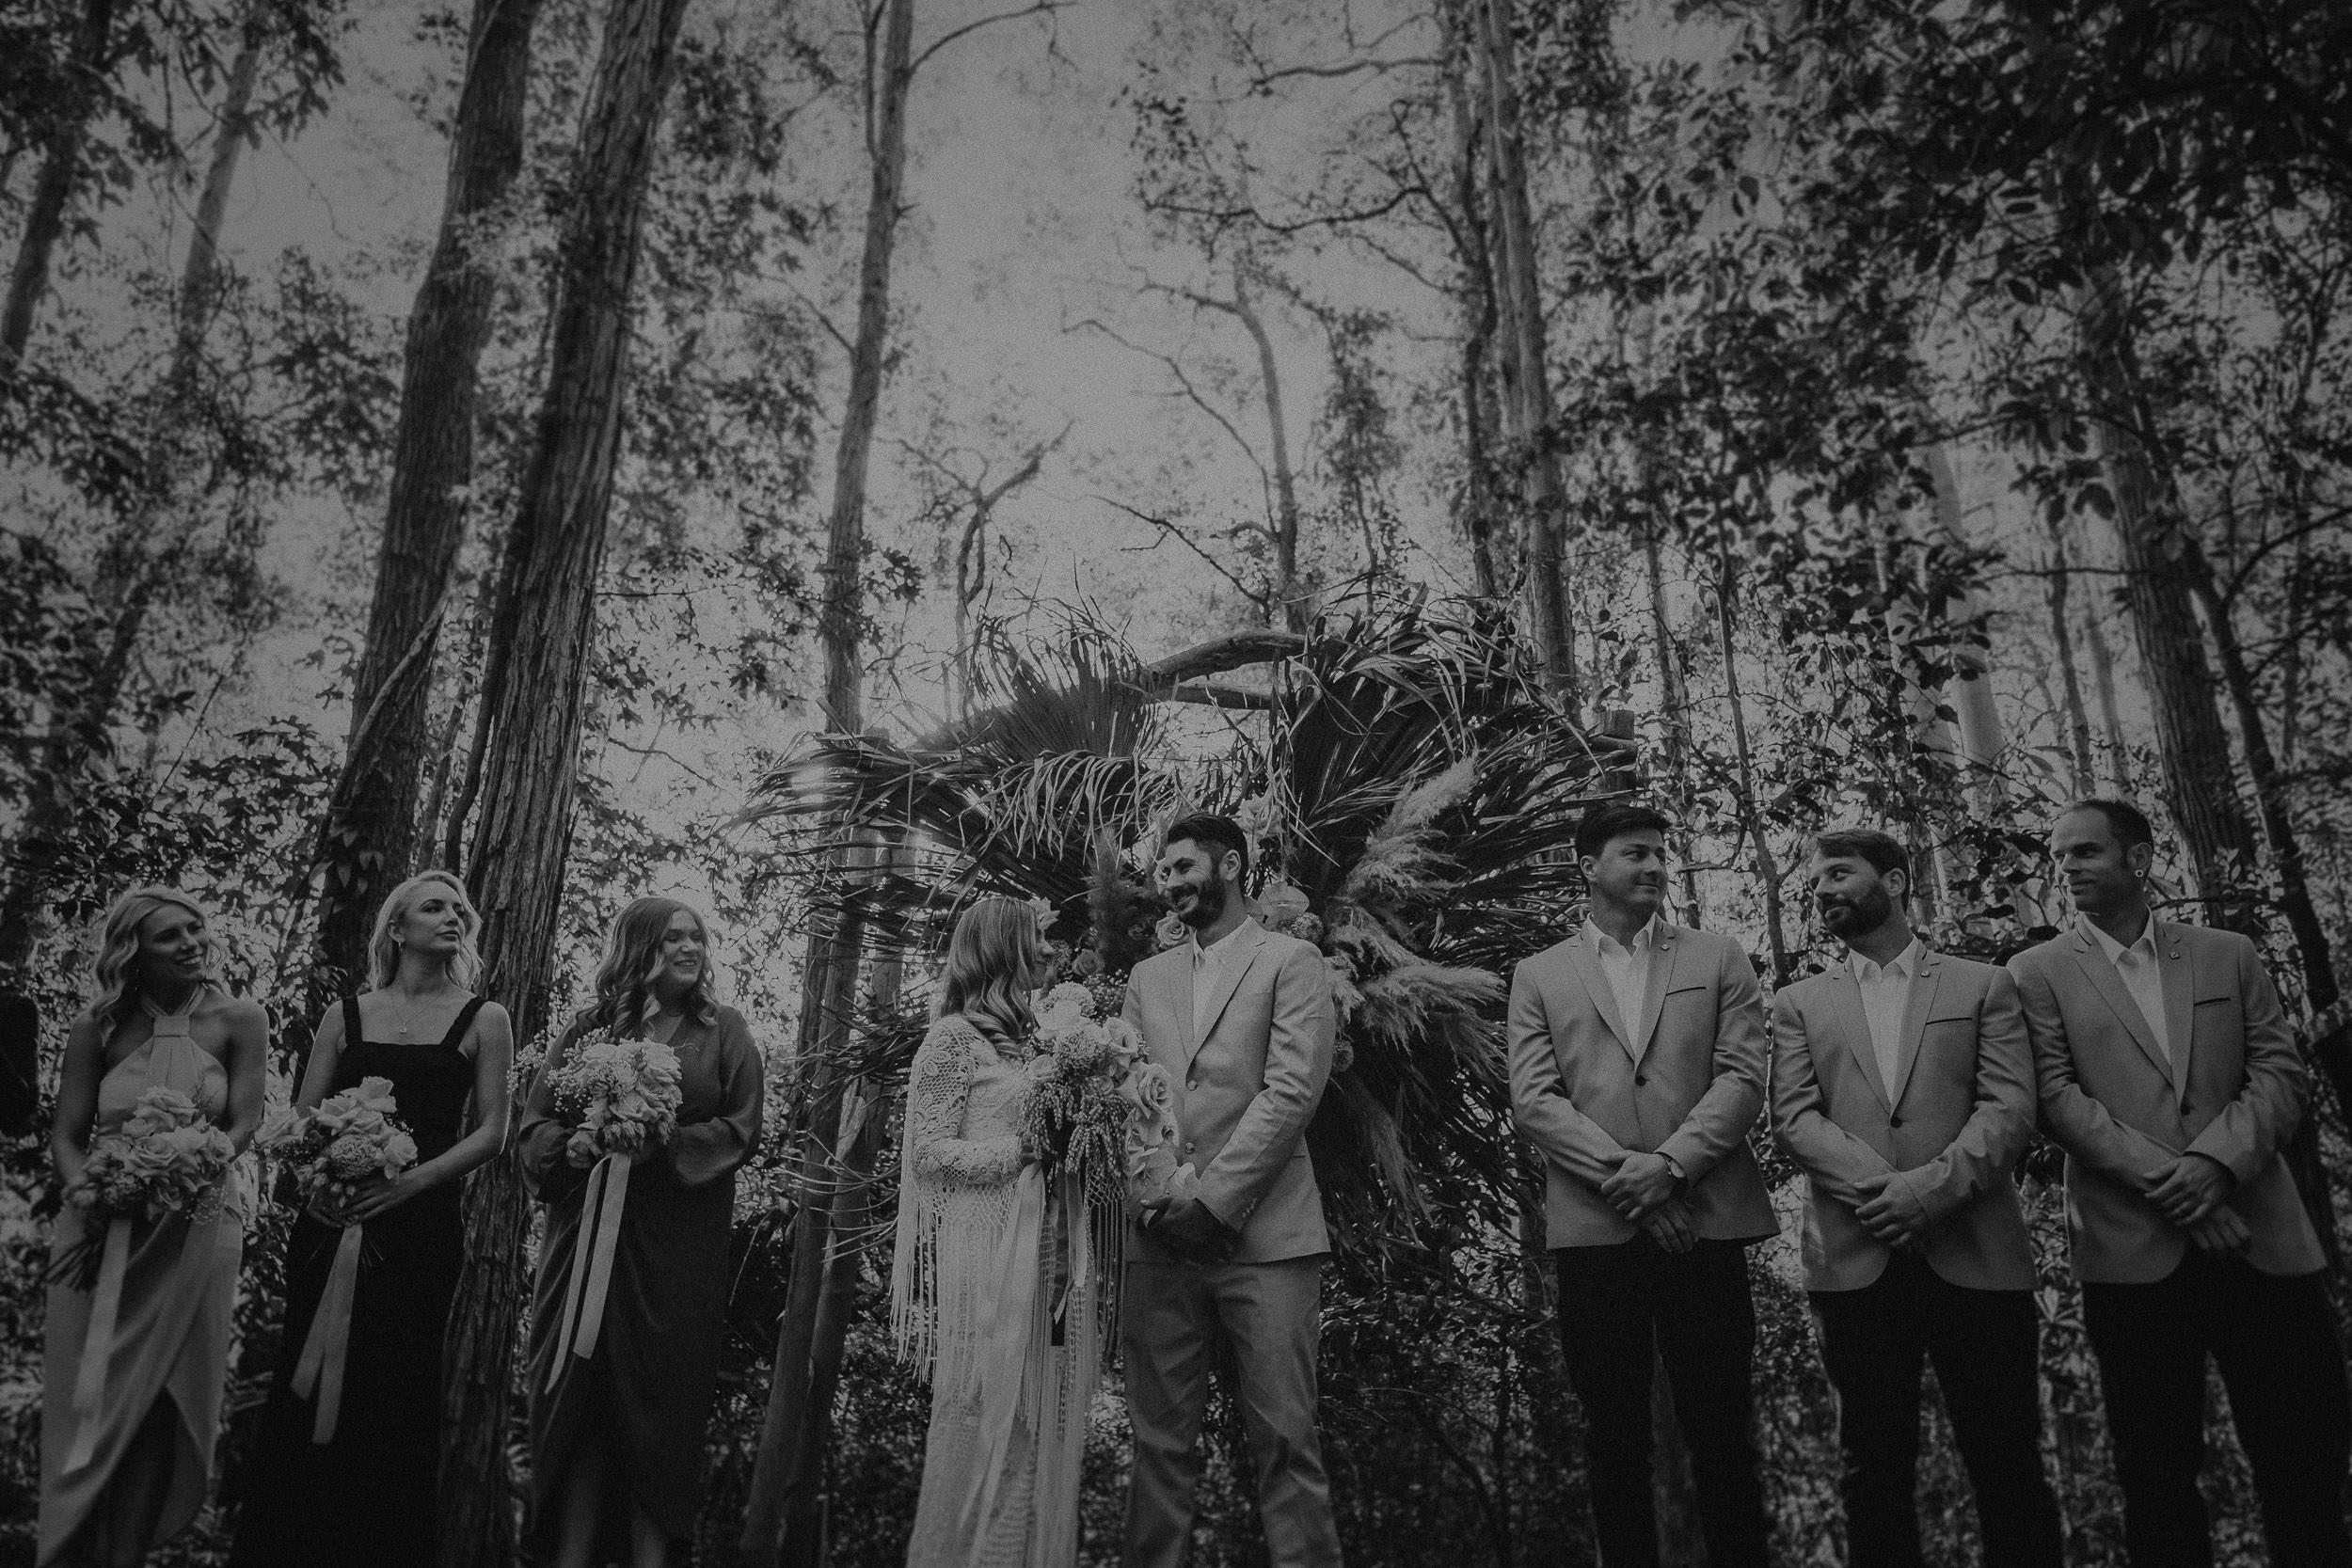 S&A Elopement - Kings & Thieves - Shred 'Til Dead - Central Coast Beach Forest Wedding - 256.jpg